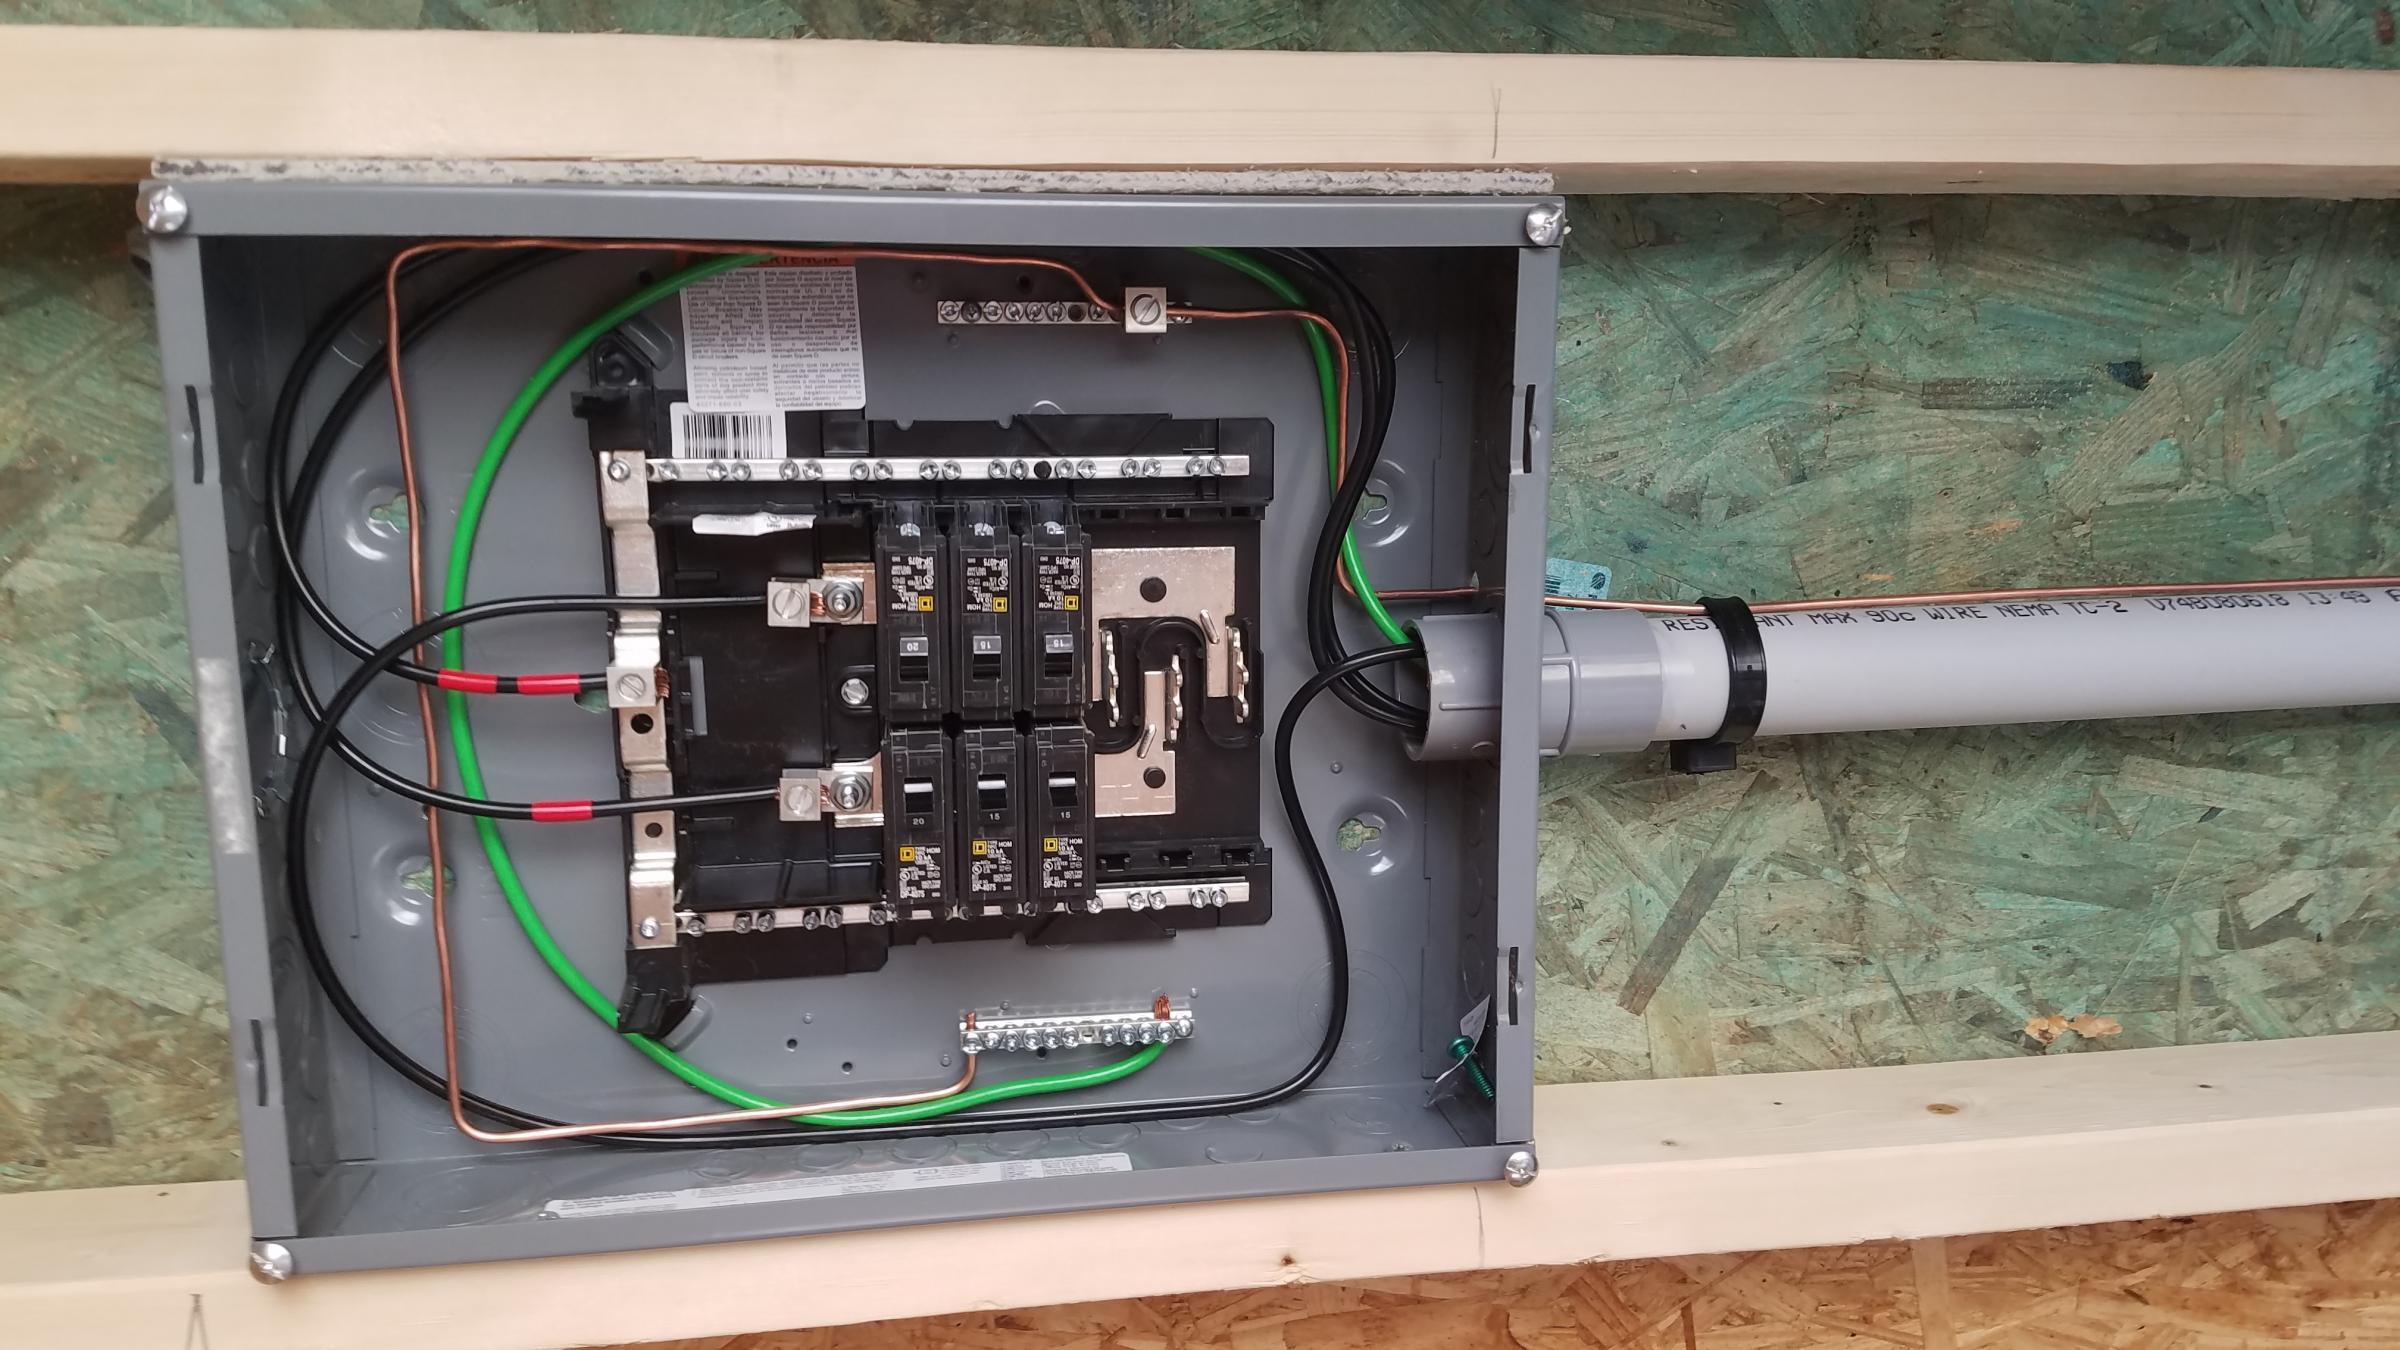 [DIAGRAM_38IU]  Sub Panel On Detached Garage - Electrical - DIY Chatroom Home Improvement  Forum   Detached Garage Sub Panel Wiring      DIY Chatroom